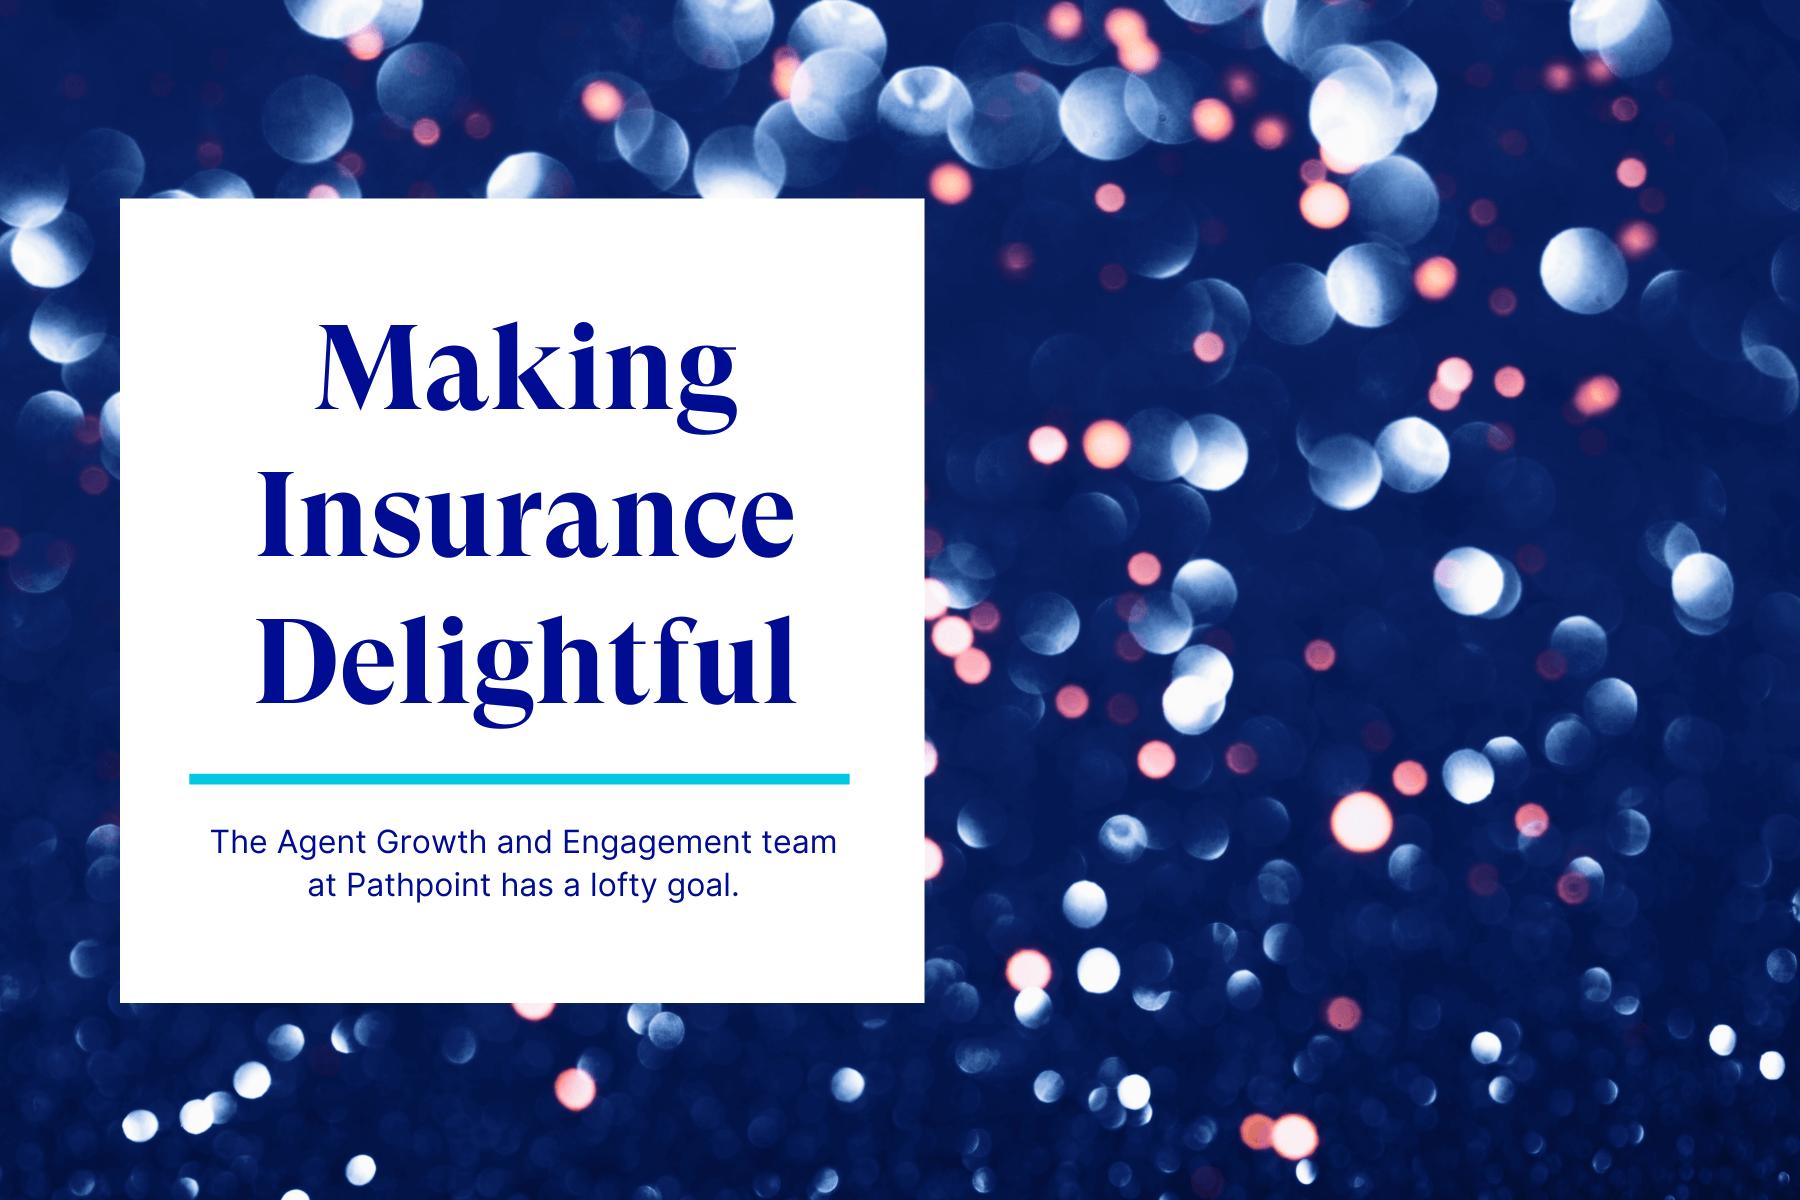 Making Insurance Delightful